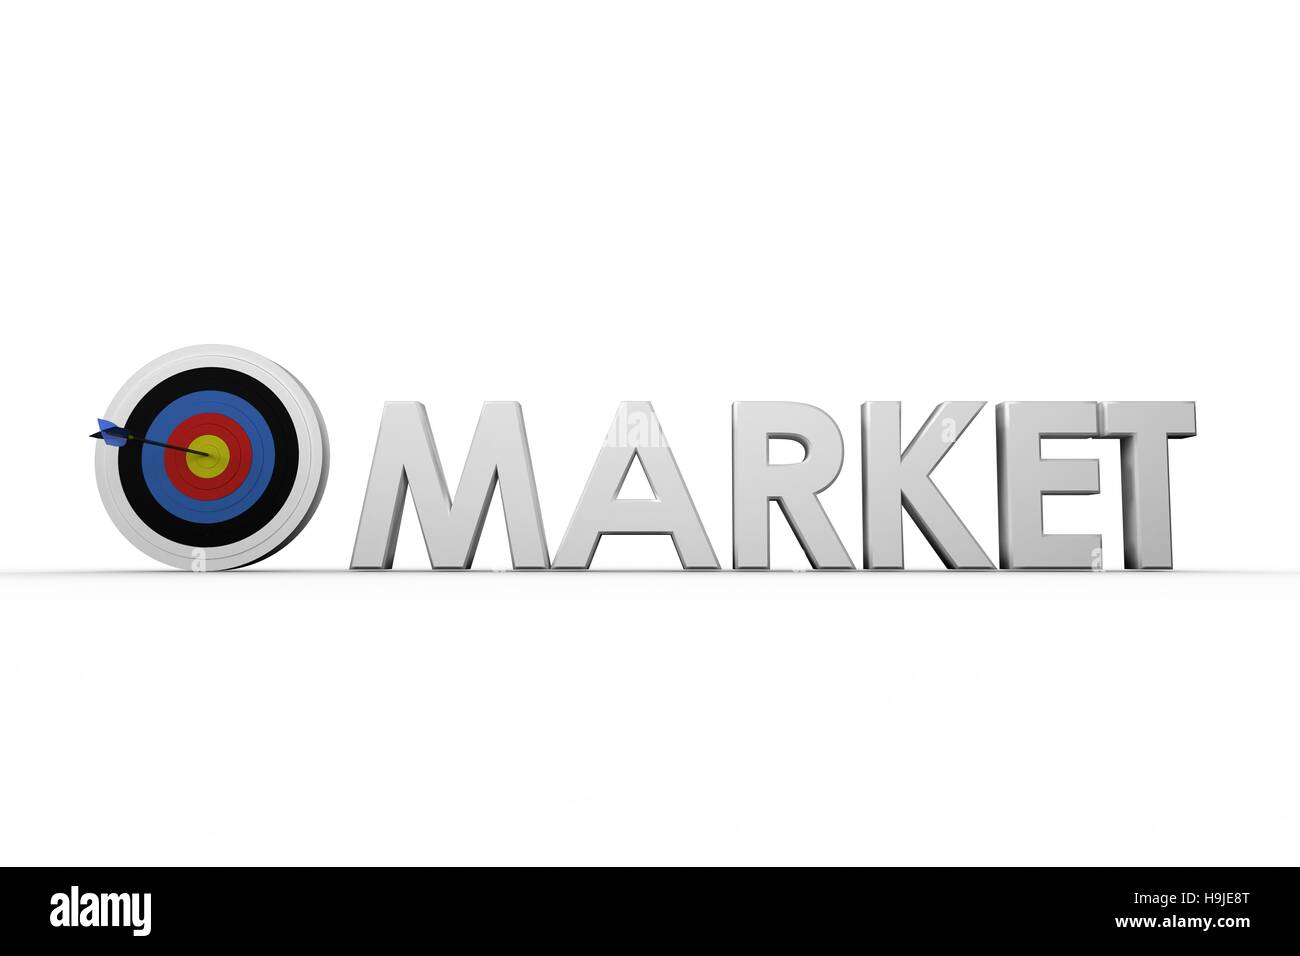 Image d'illustration du mot market Photo Stock